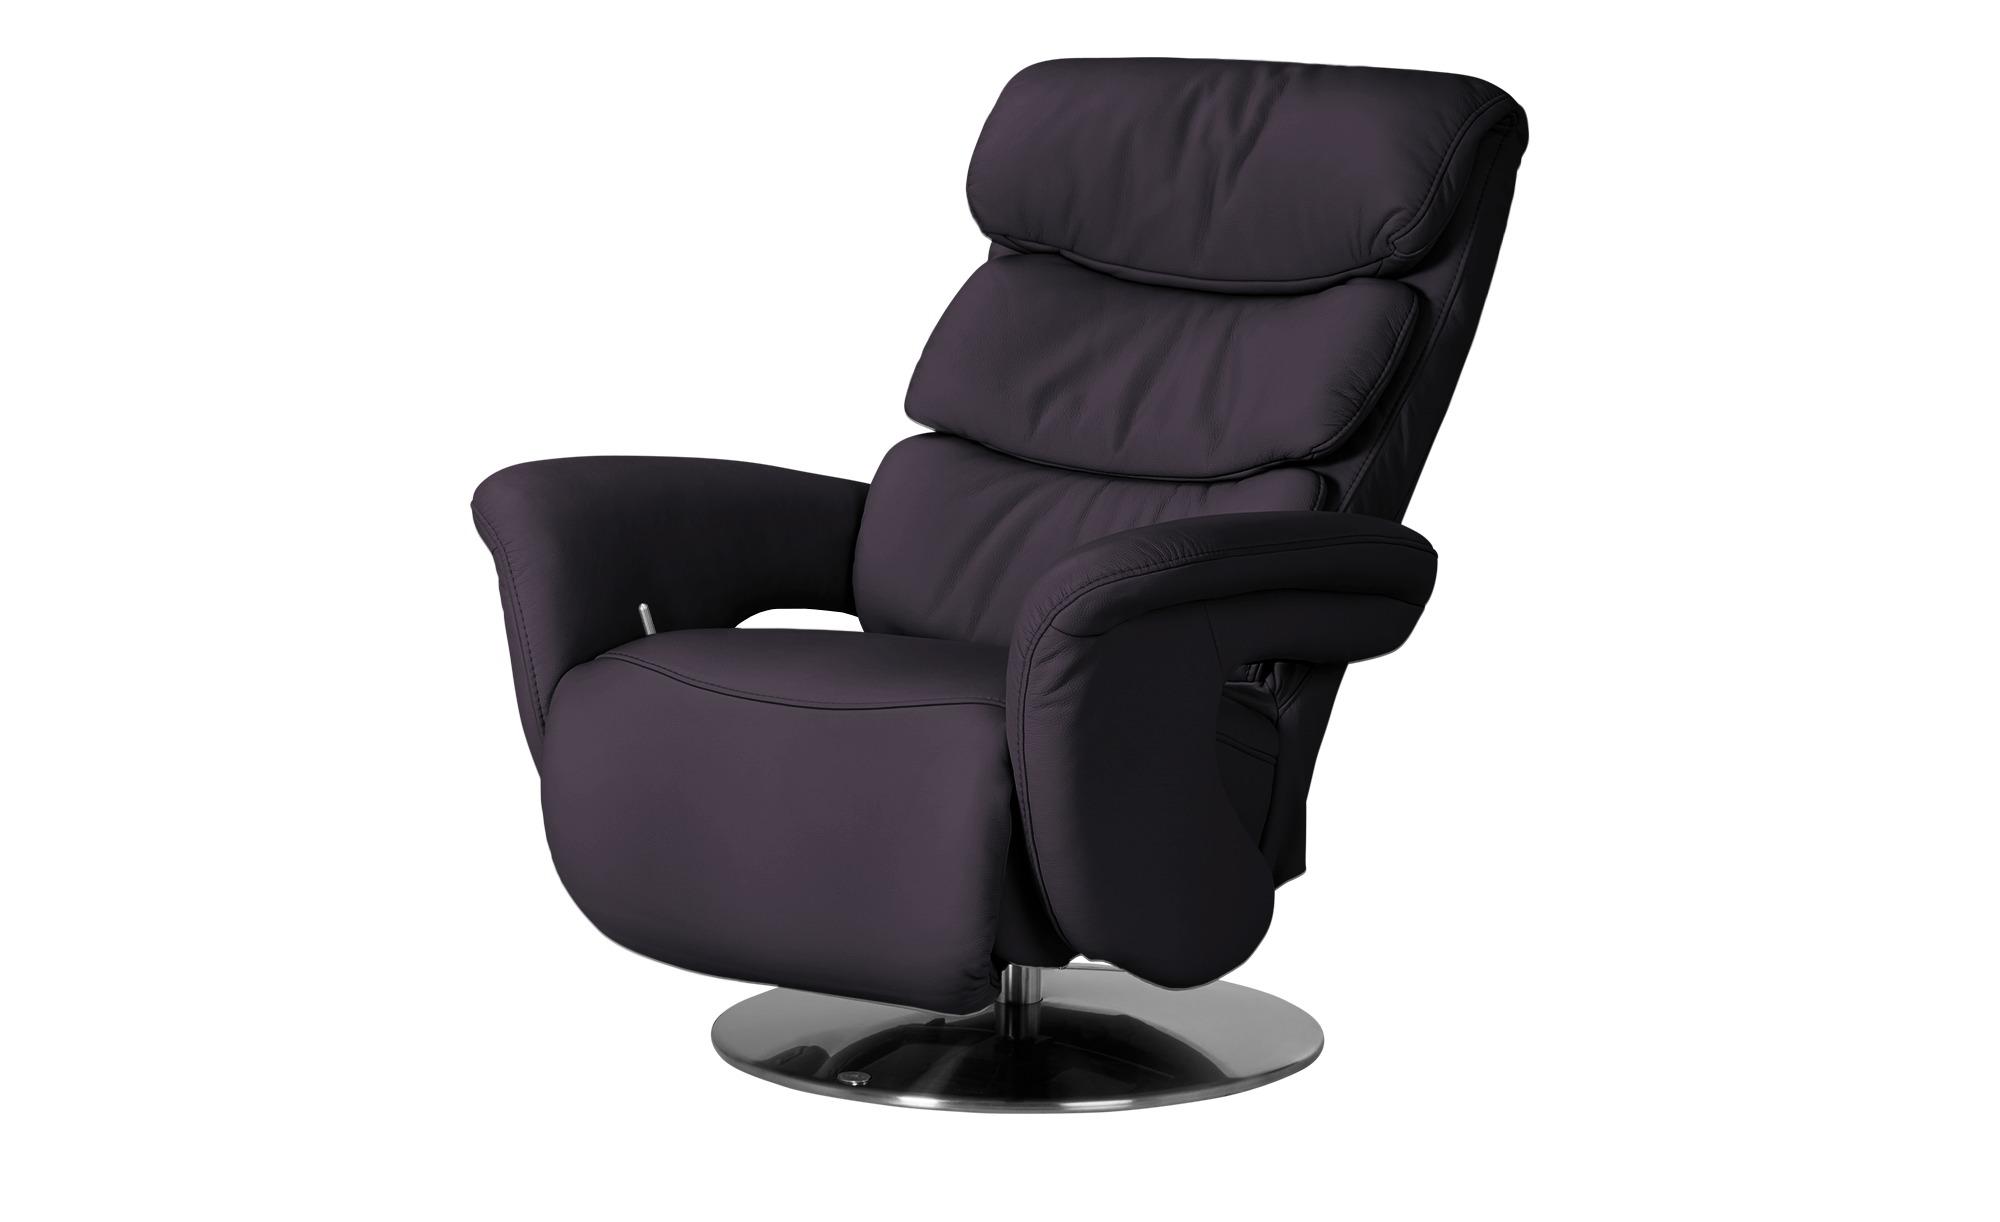 himolla Leder-Relaxsessel lila - Leder 7228 ¦ lila/violett ¦ Maße (cm): B: 83 H: 113 T: 92 Polstermöbel > Sessel > Fernsehsessel - Höffner